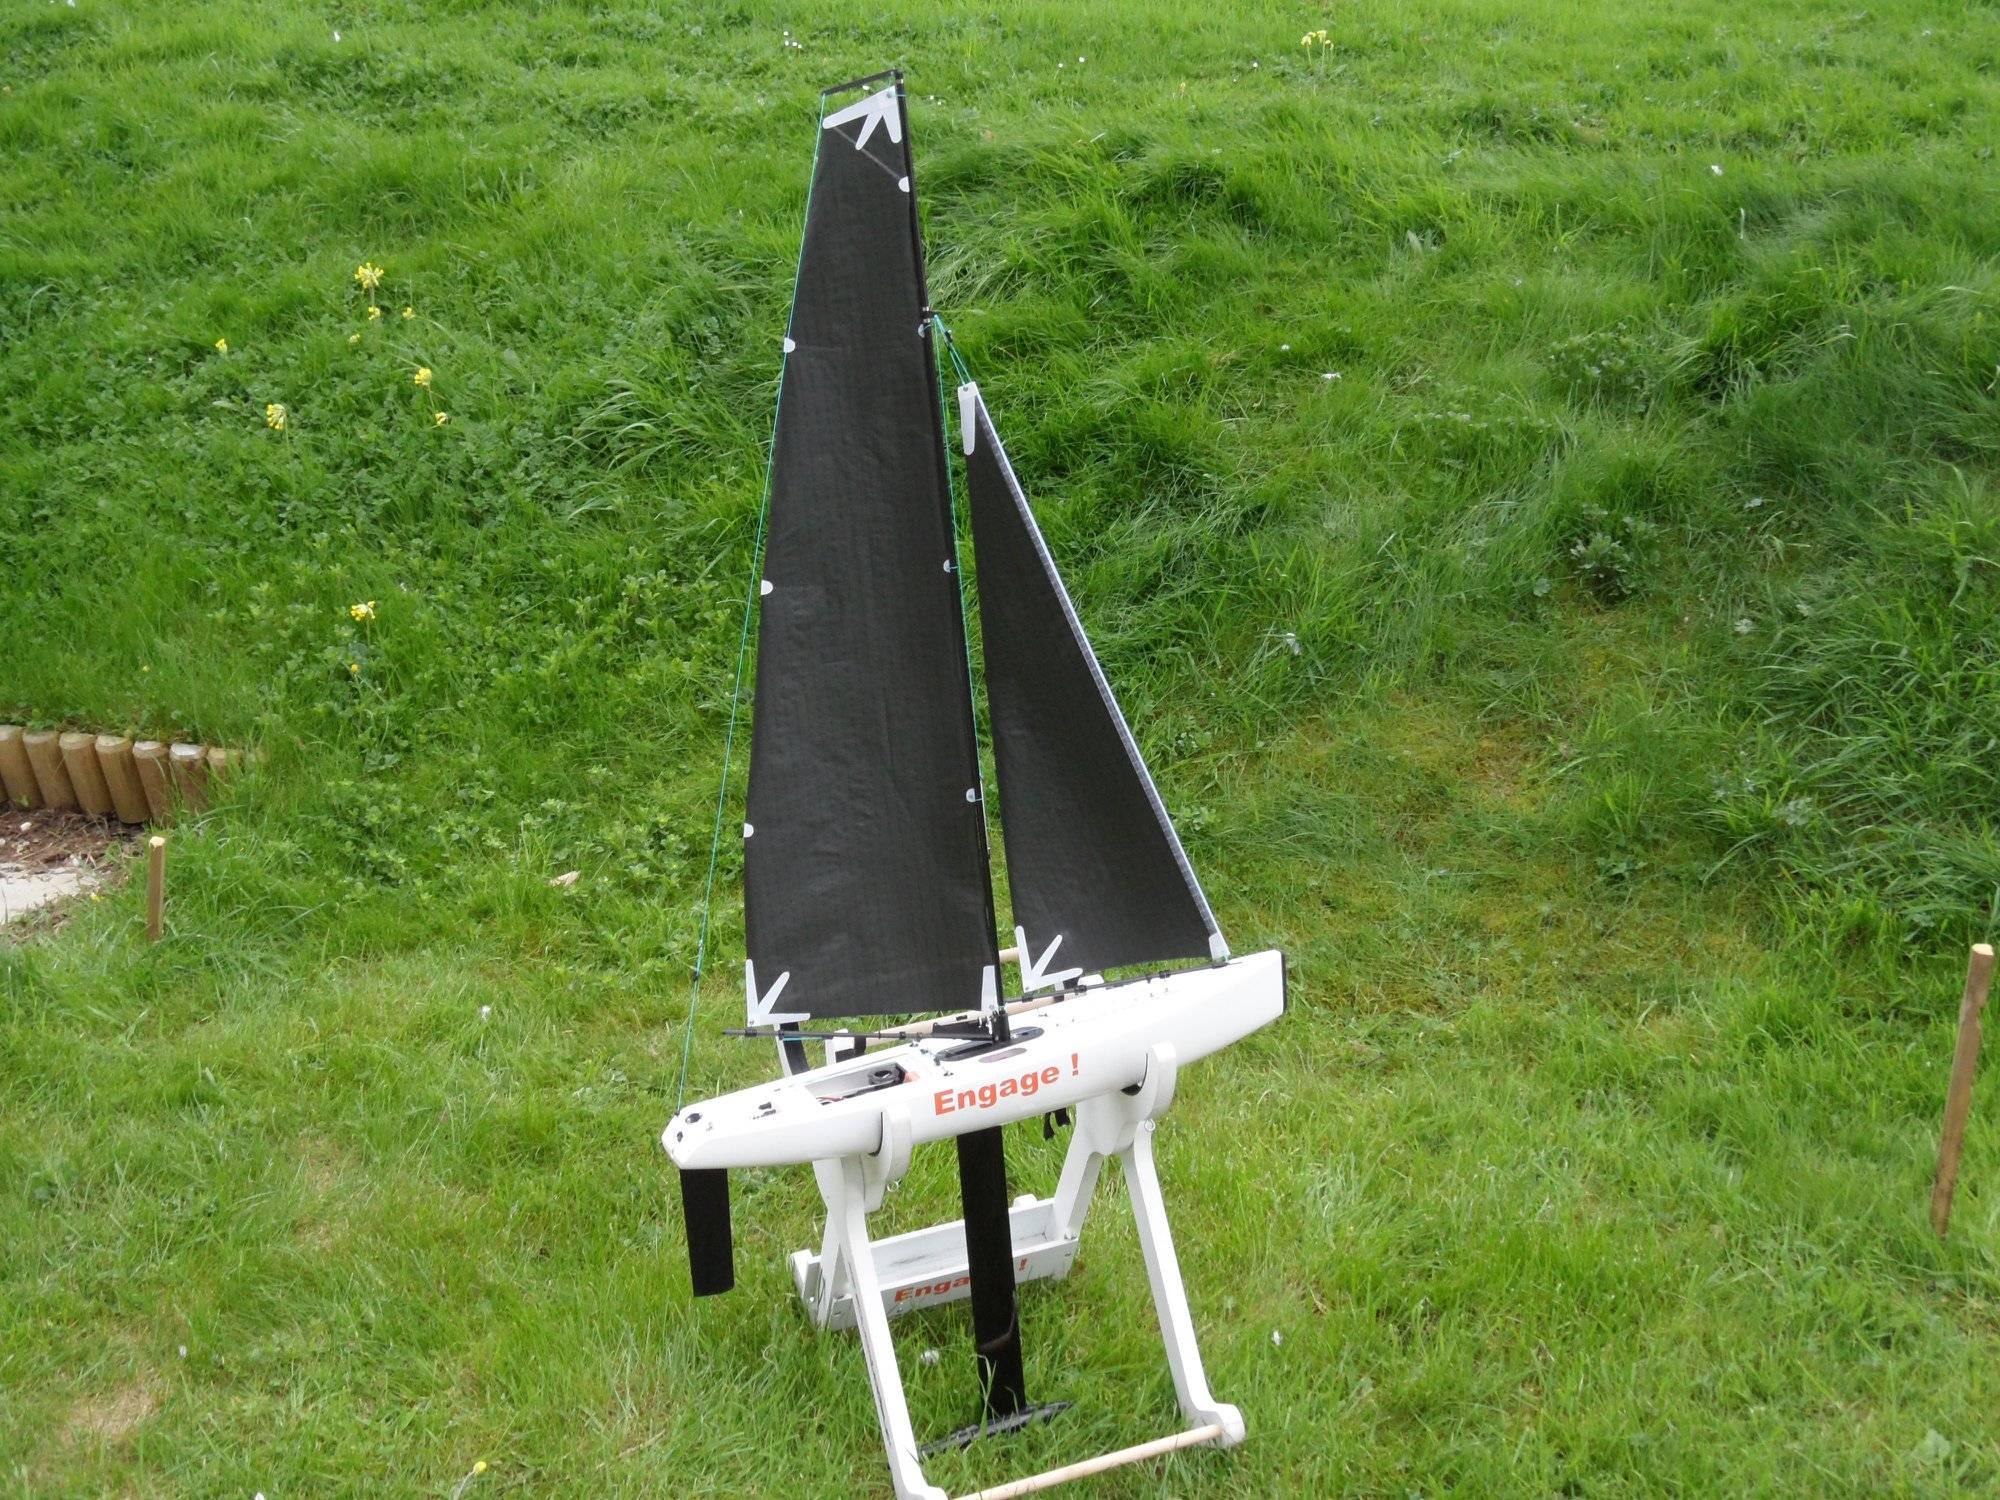 the black sails